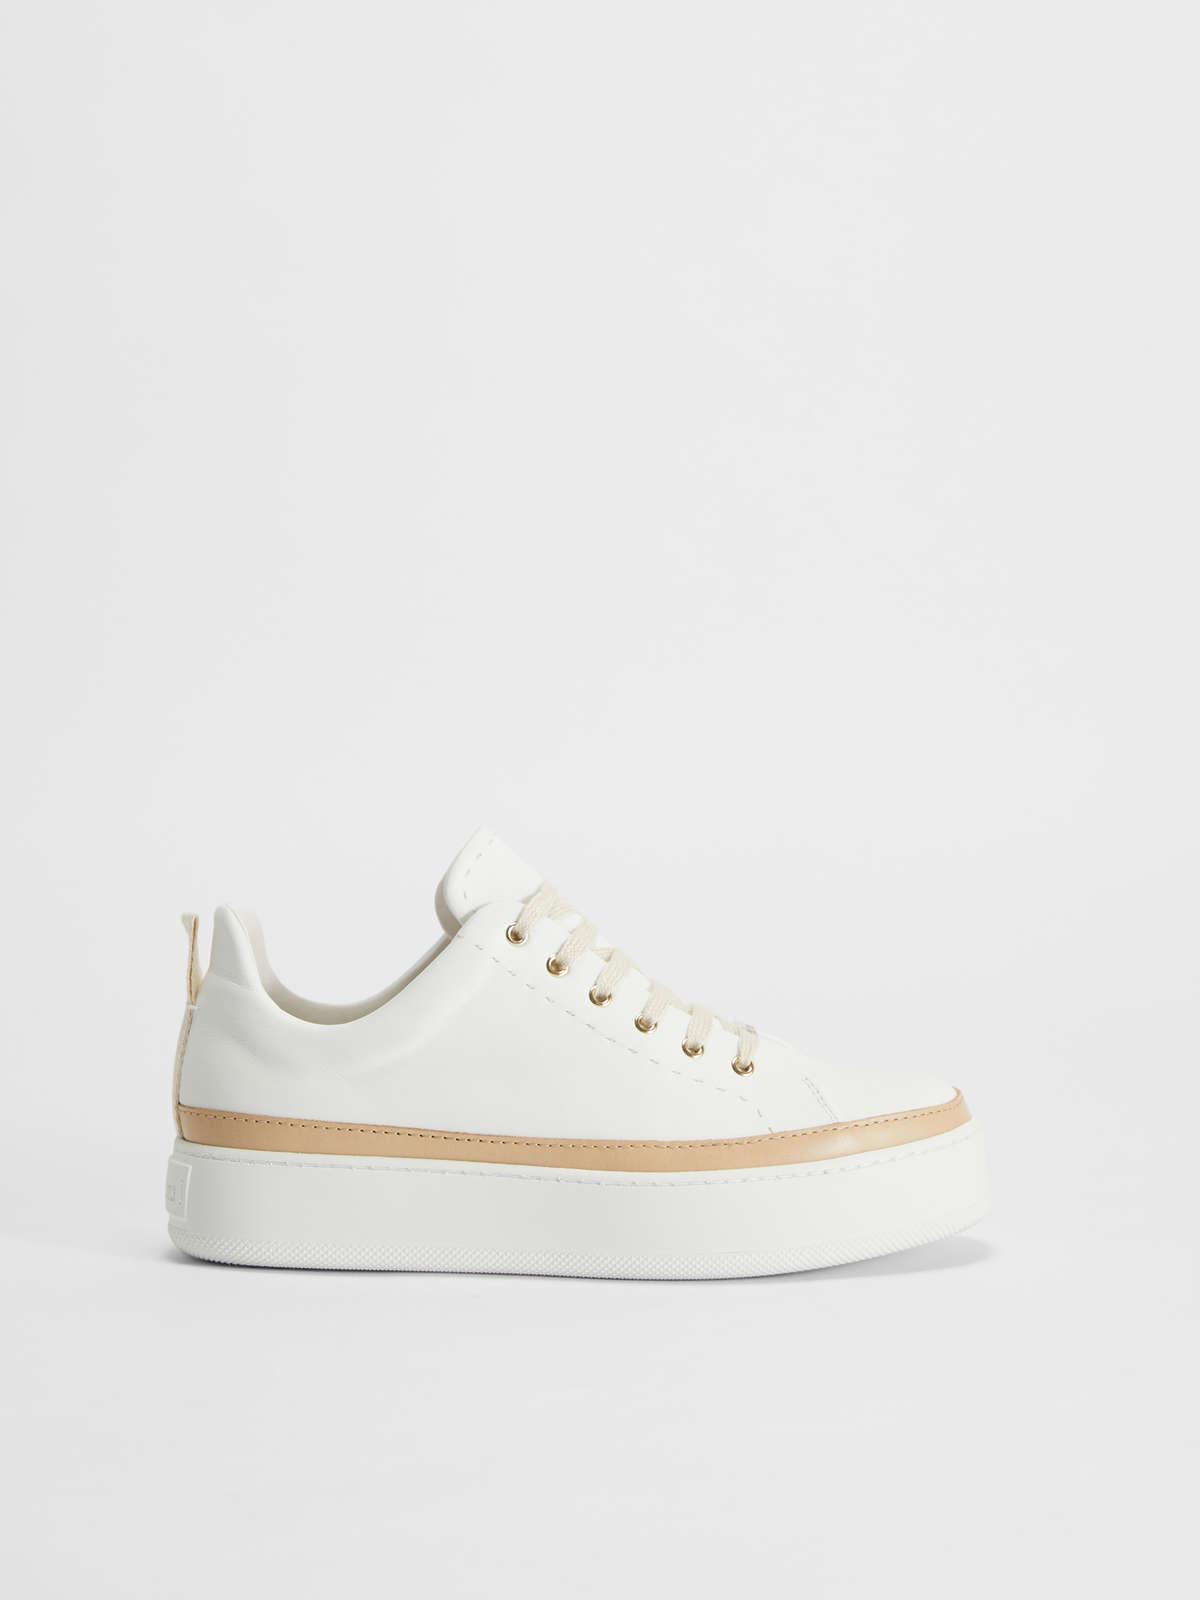 Leather sneaker - Max Mara